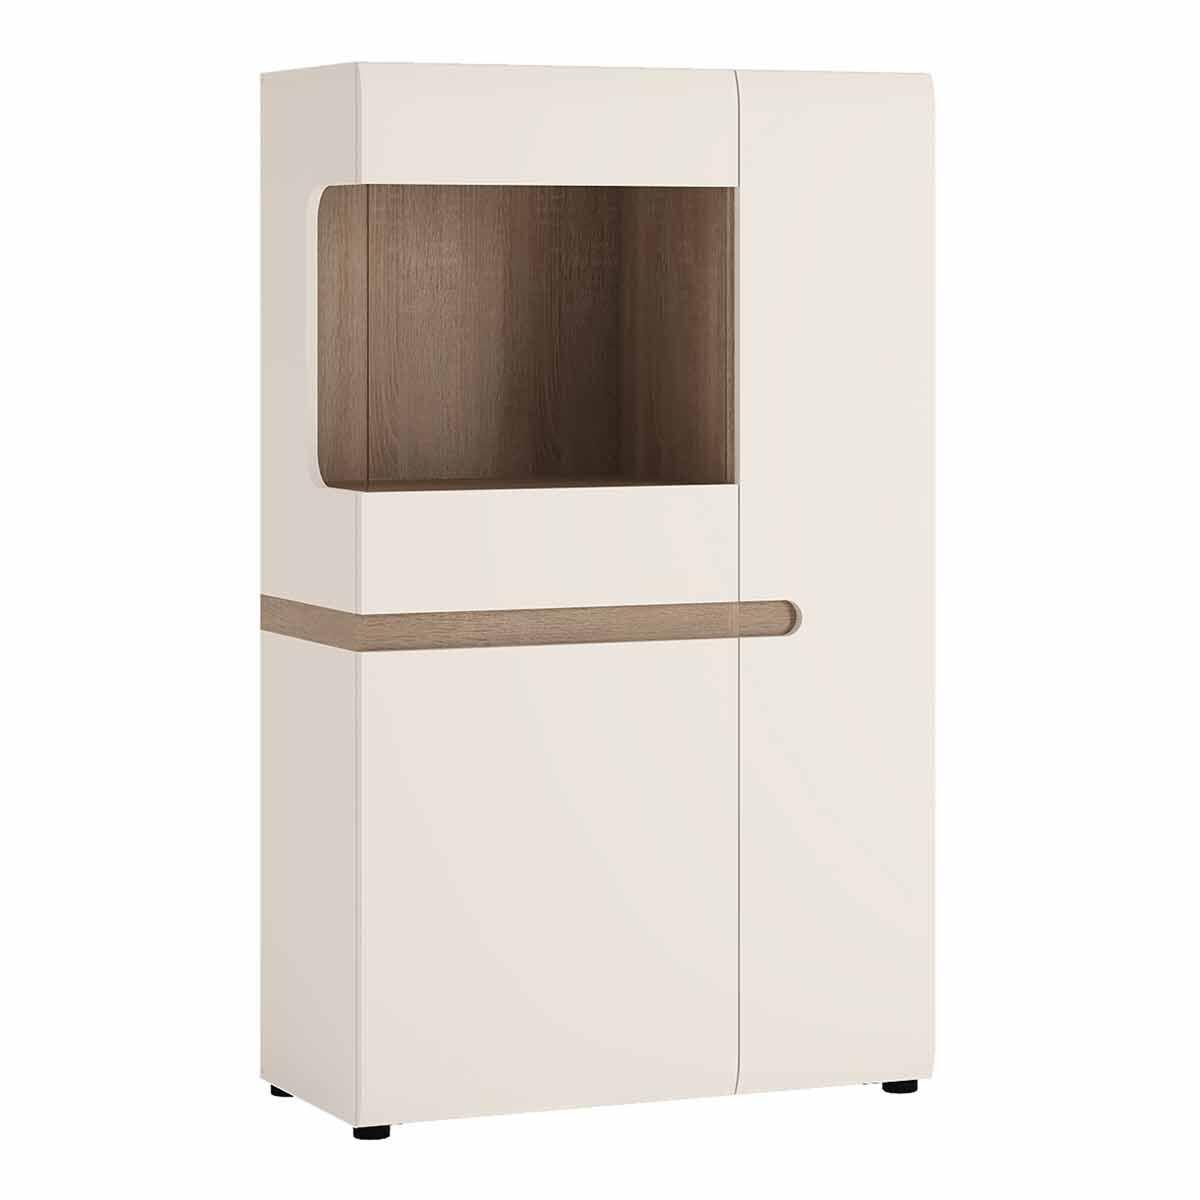 Chelsea Living Low Display Cabinet 85cm